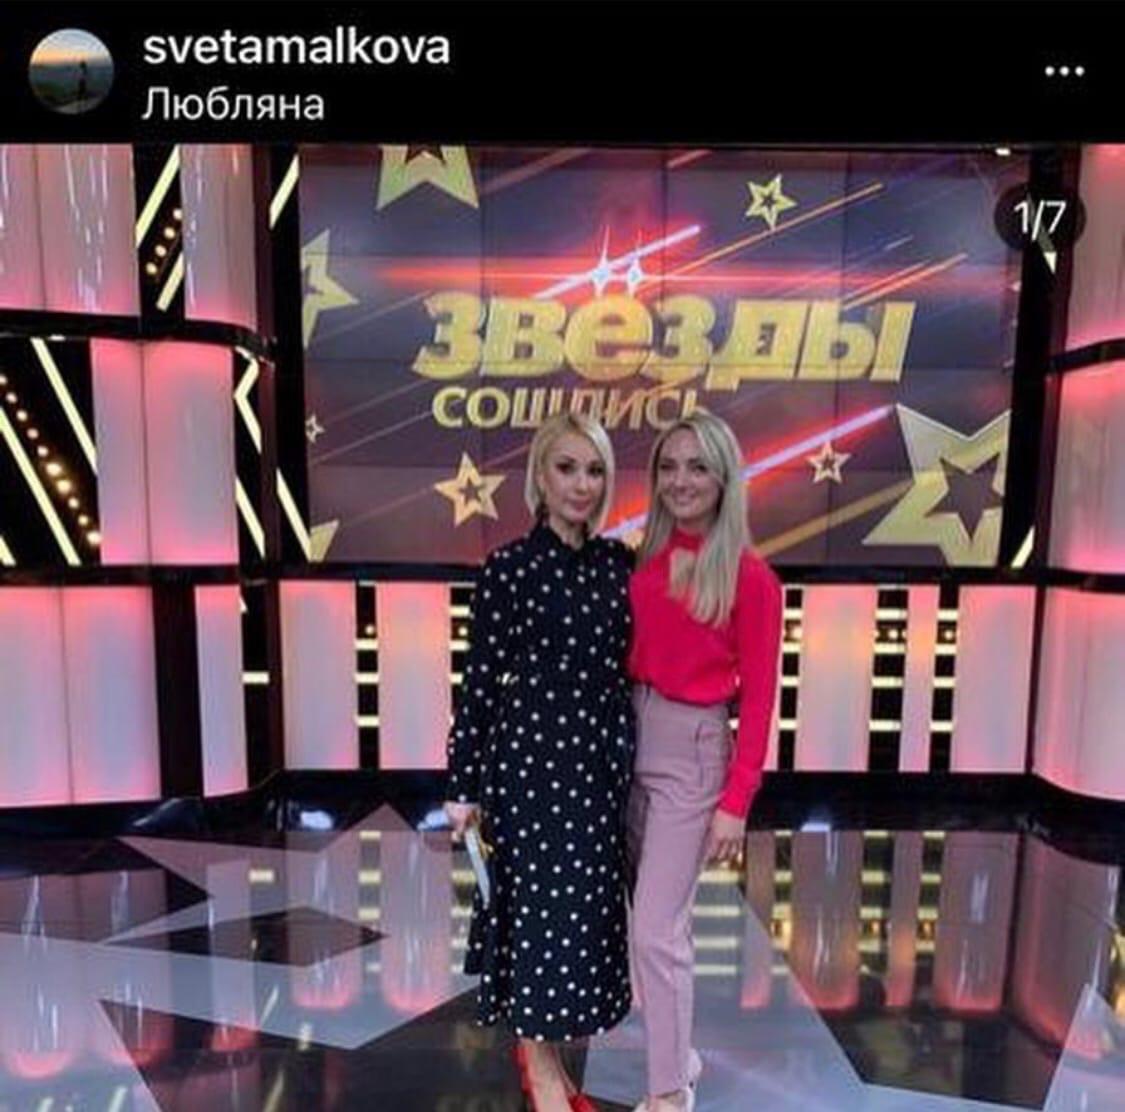 """Breaking the psyche of children"": How Anastasia Makeeva commented on the behavior of her lover"